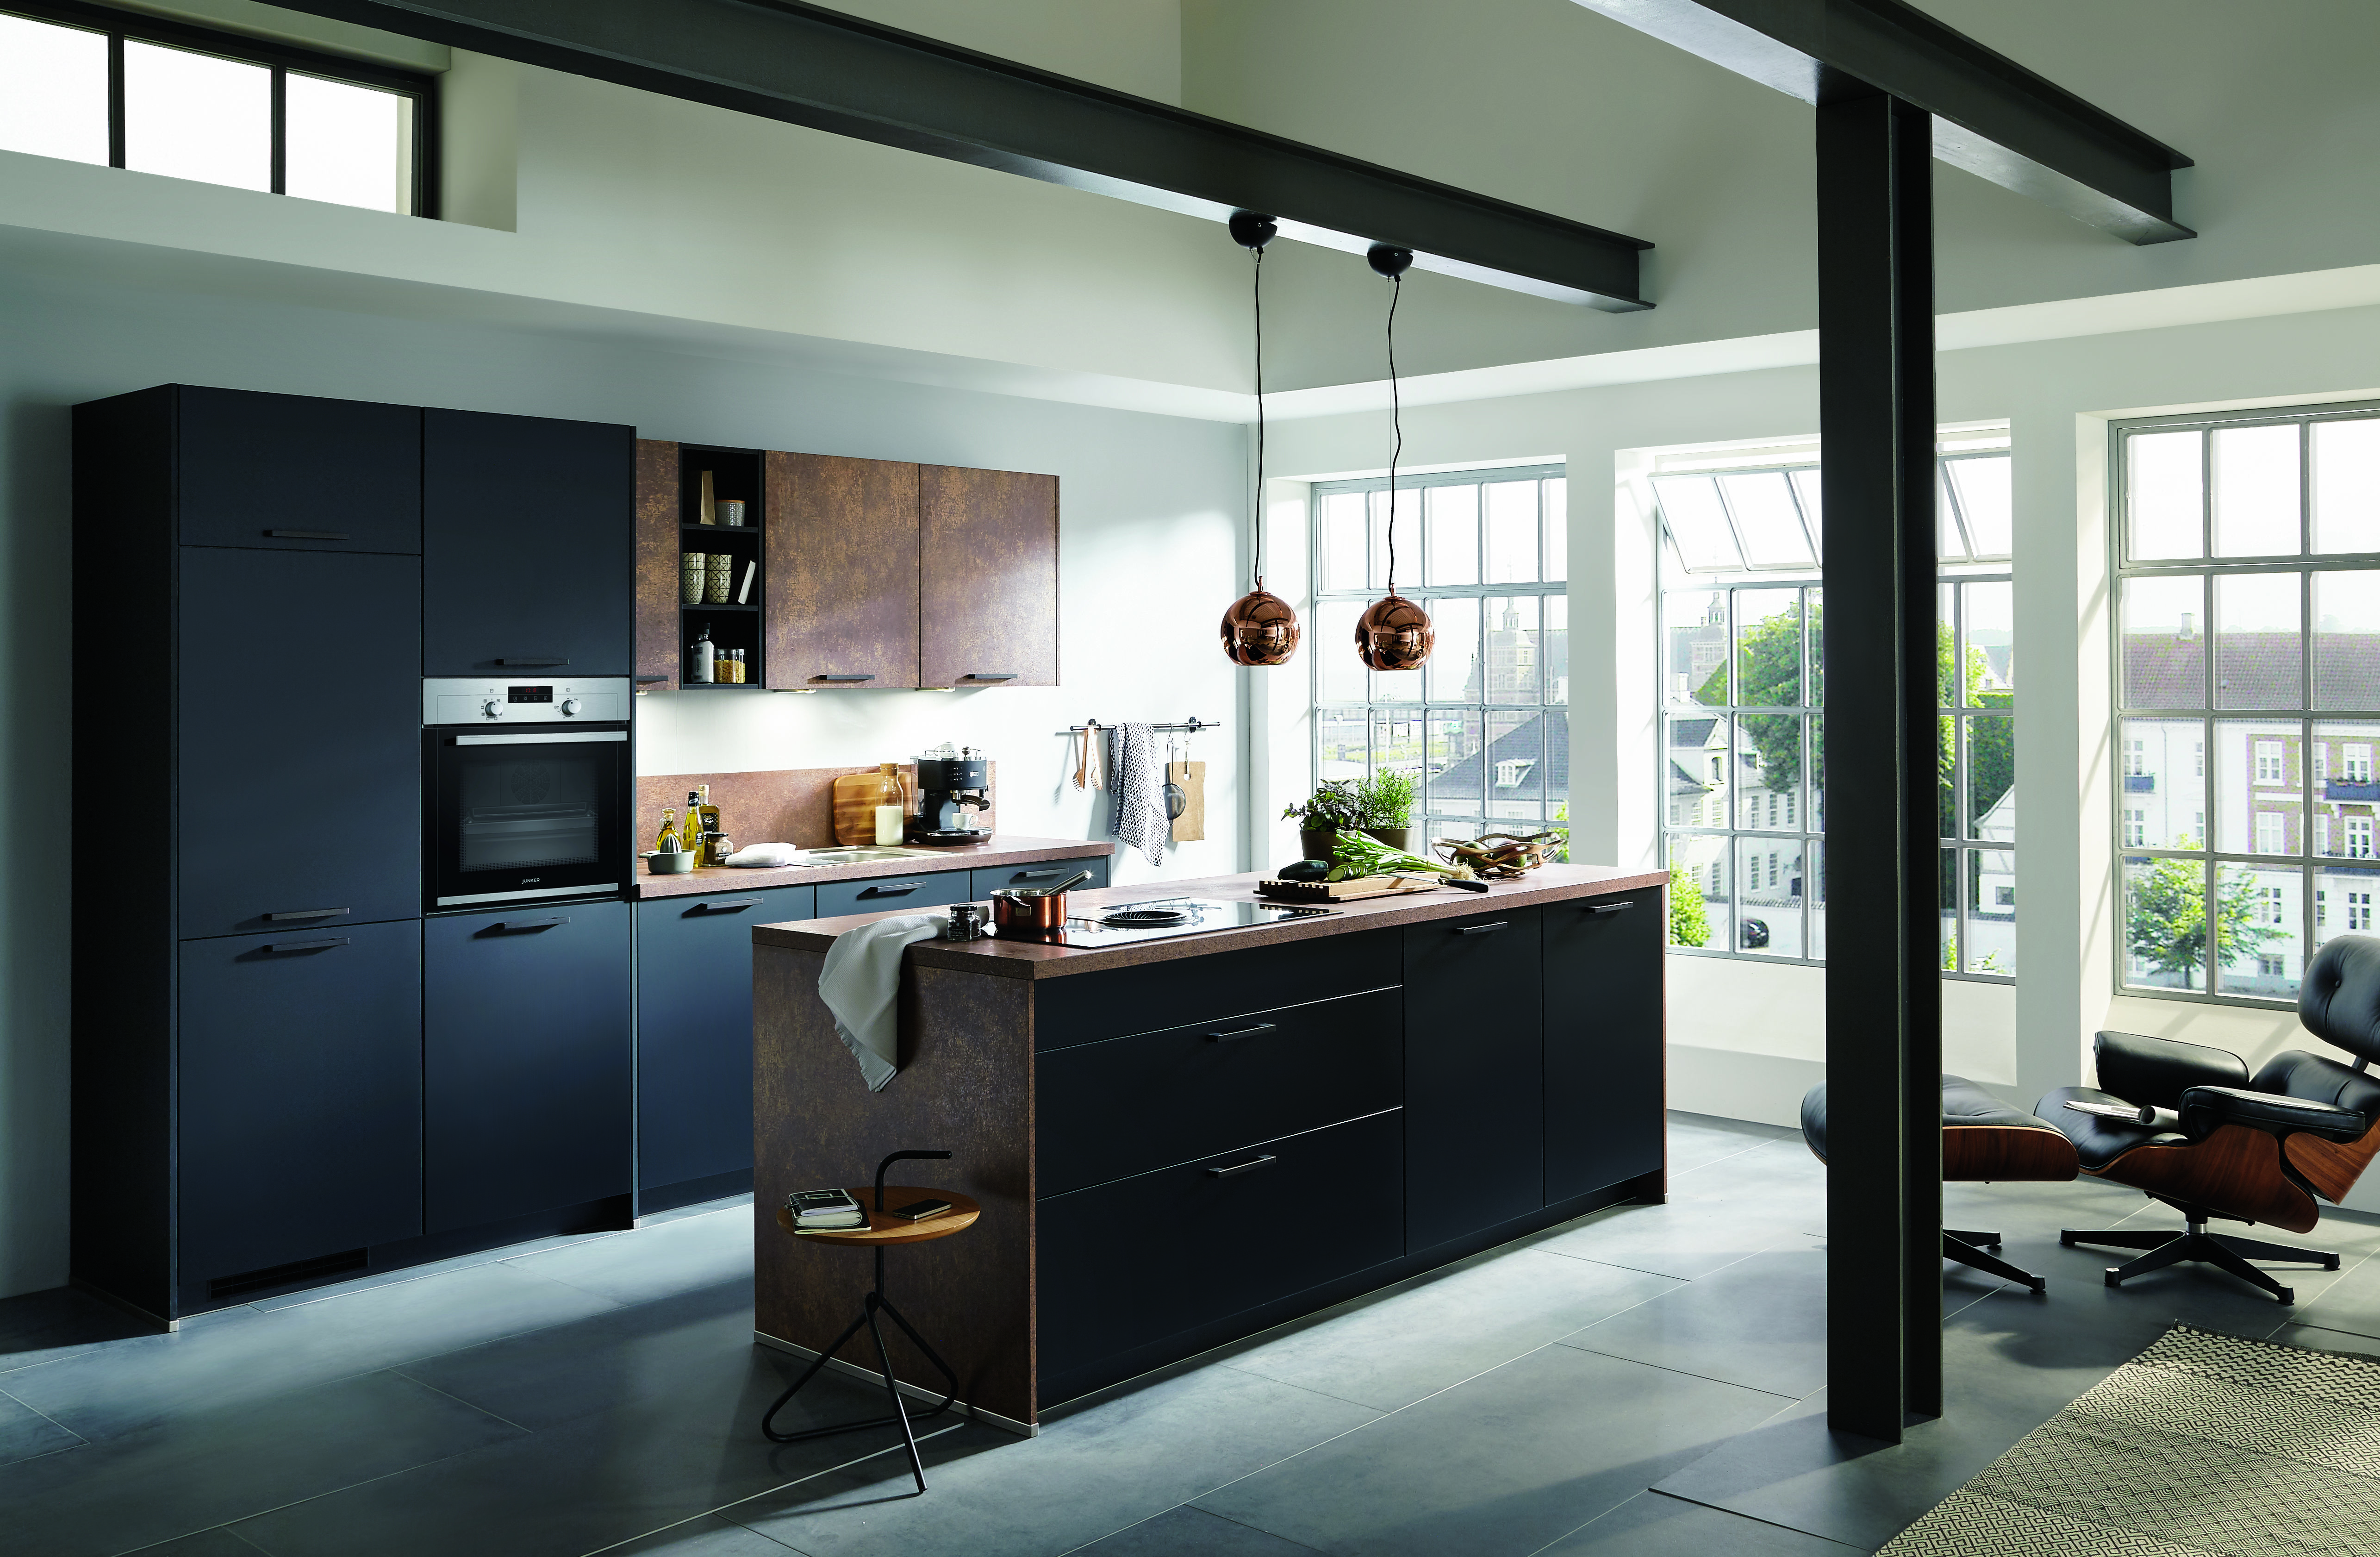 schwarze k chen k chentrends in schwarz k che co. Black Bedroom Furniture Sets. Home Design Ideas